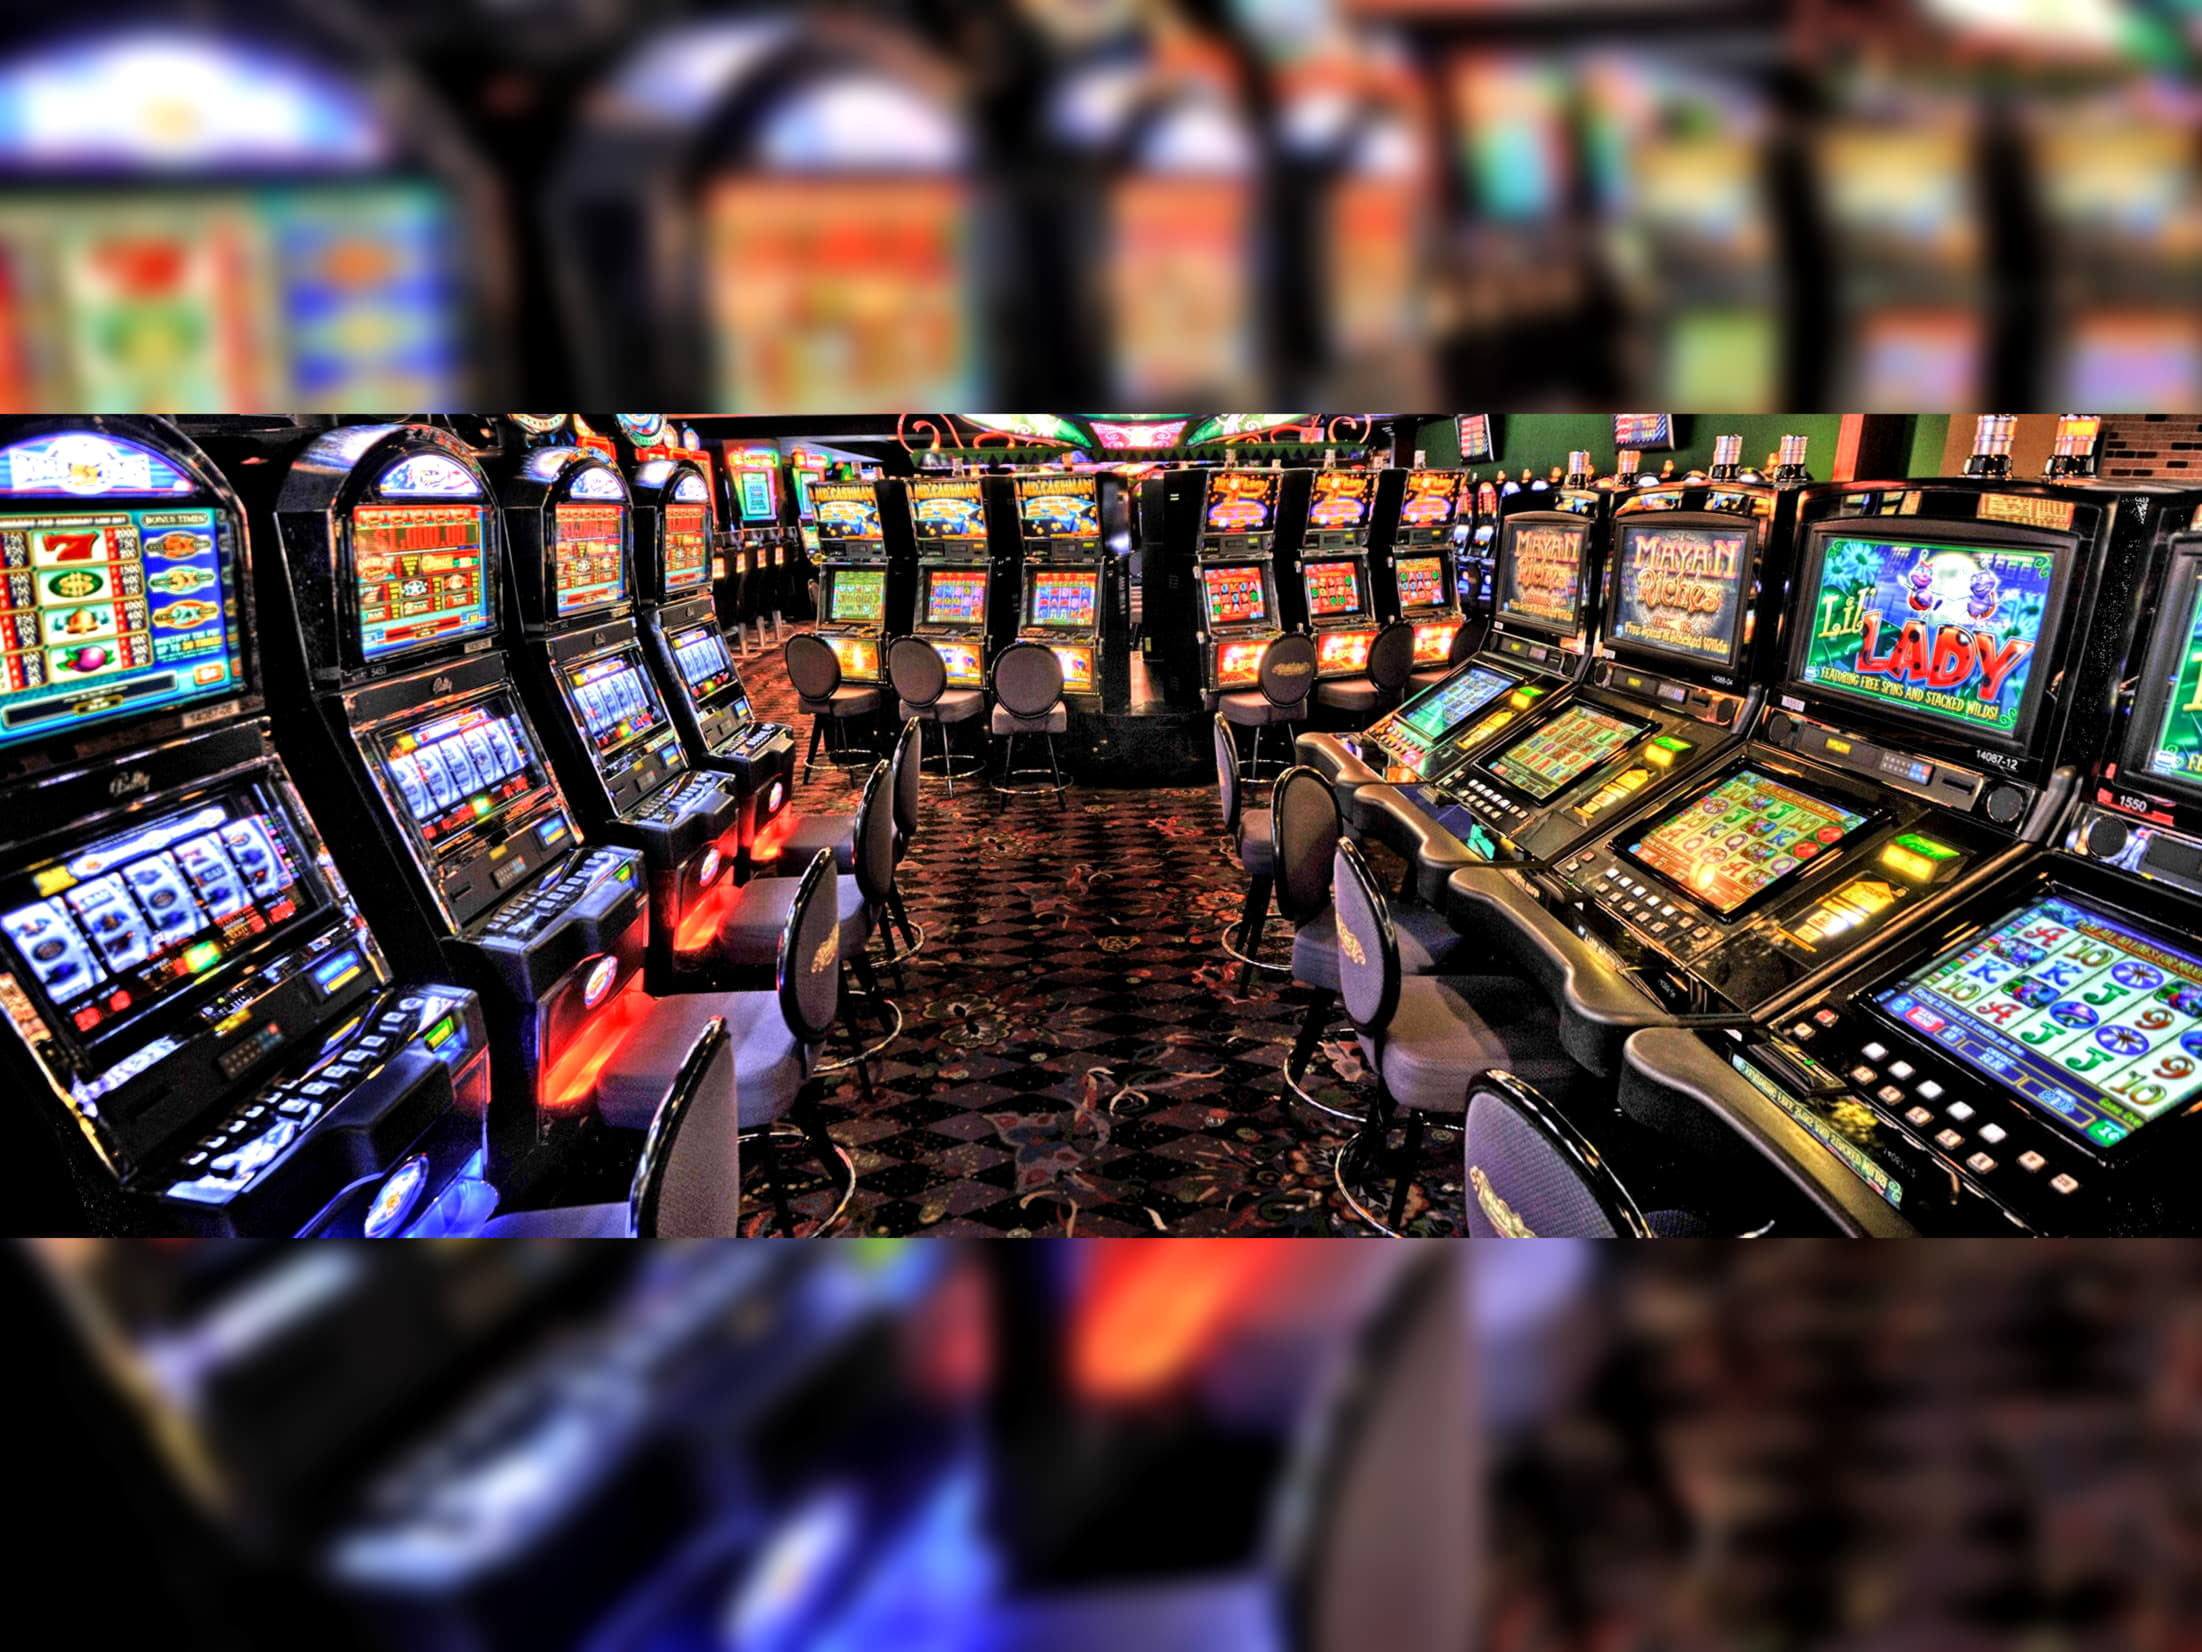 222 free spins casino at Guts Casino